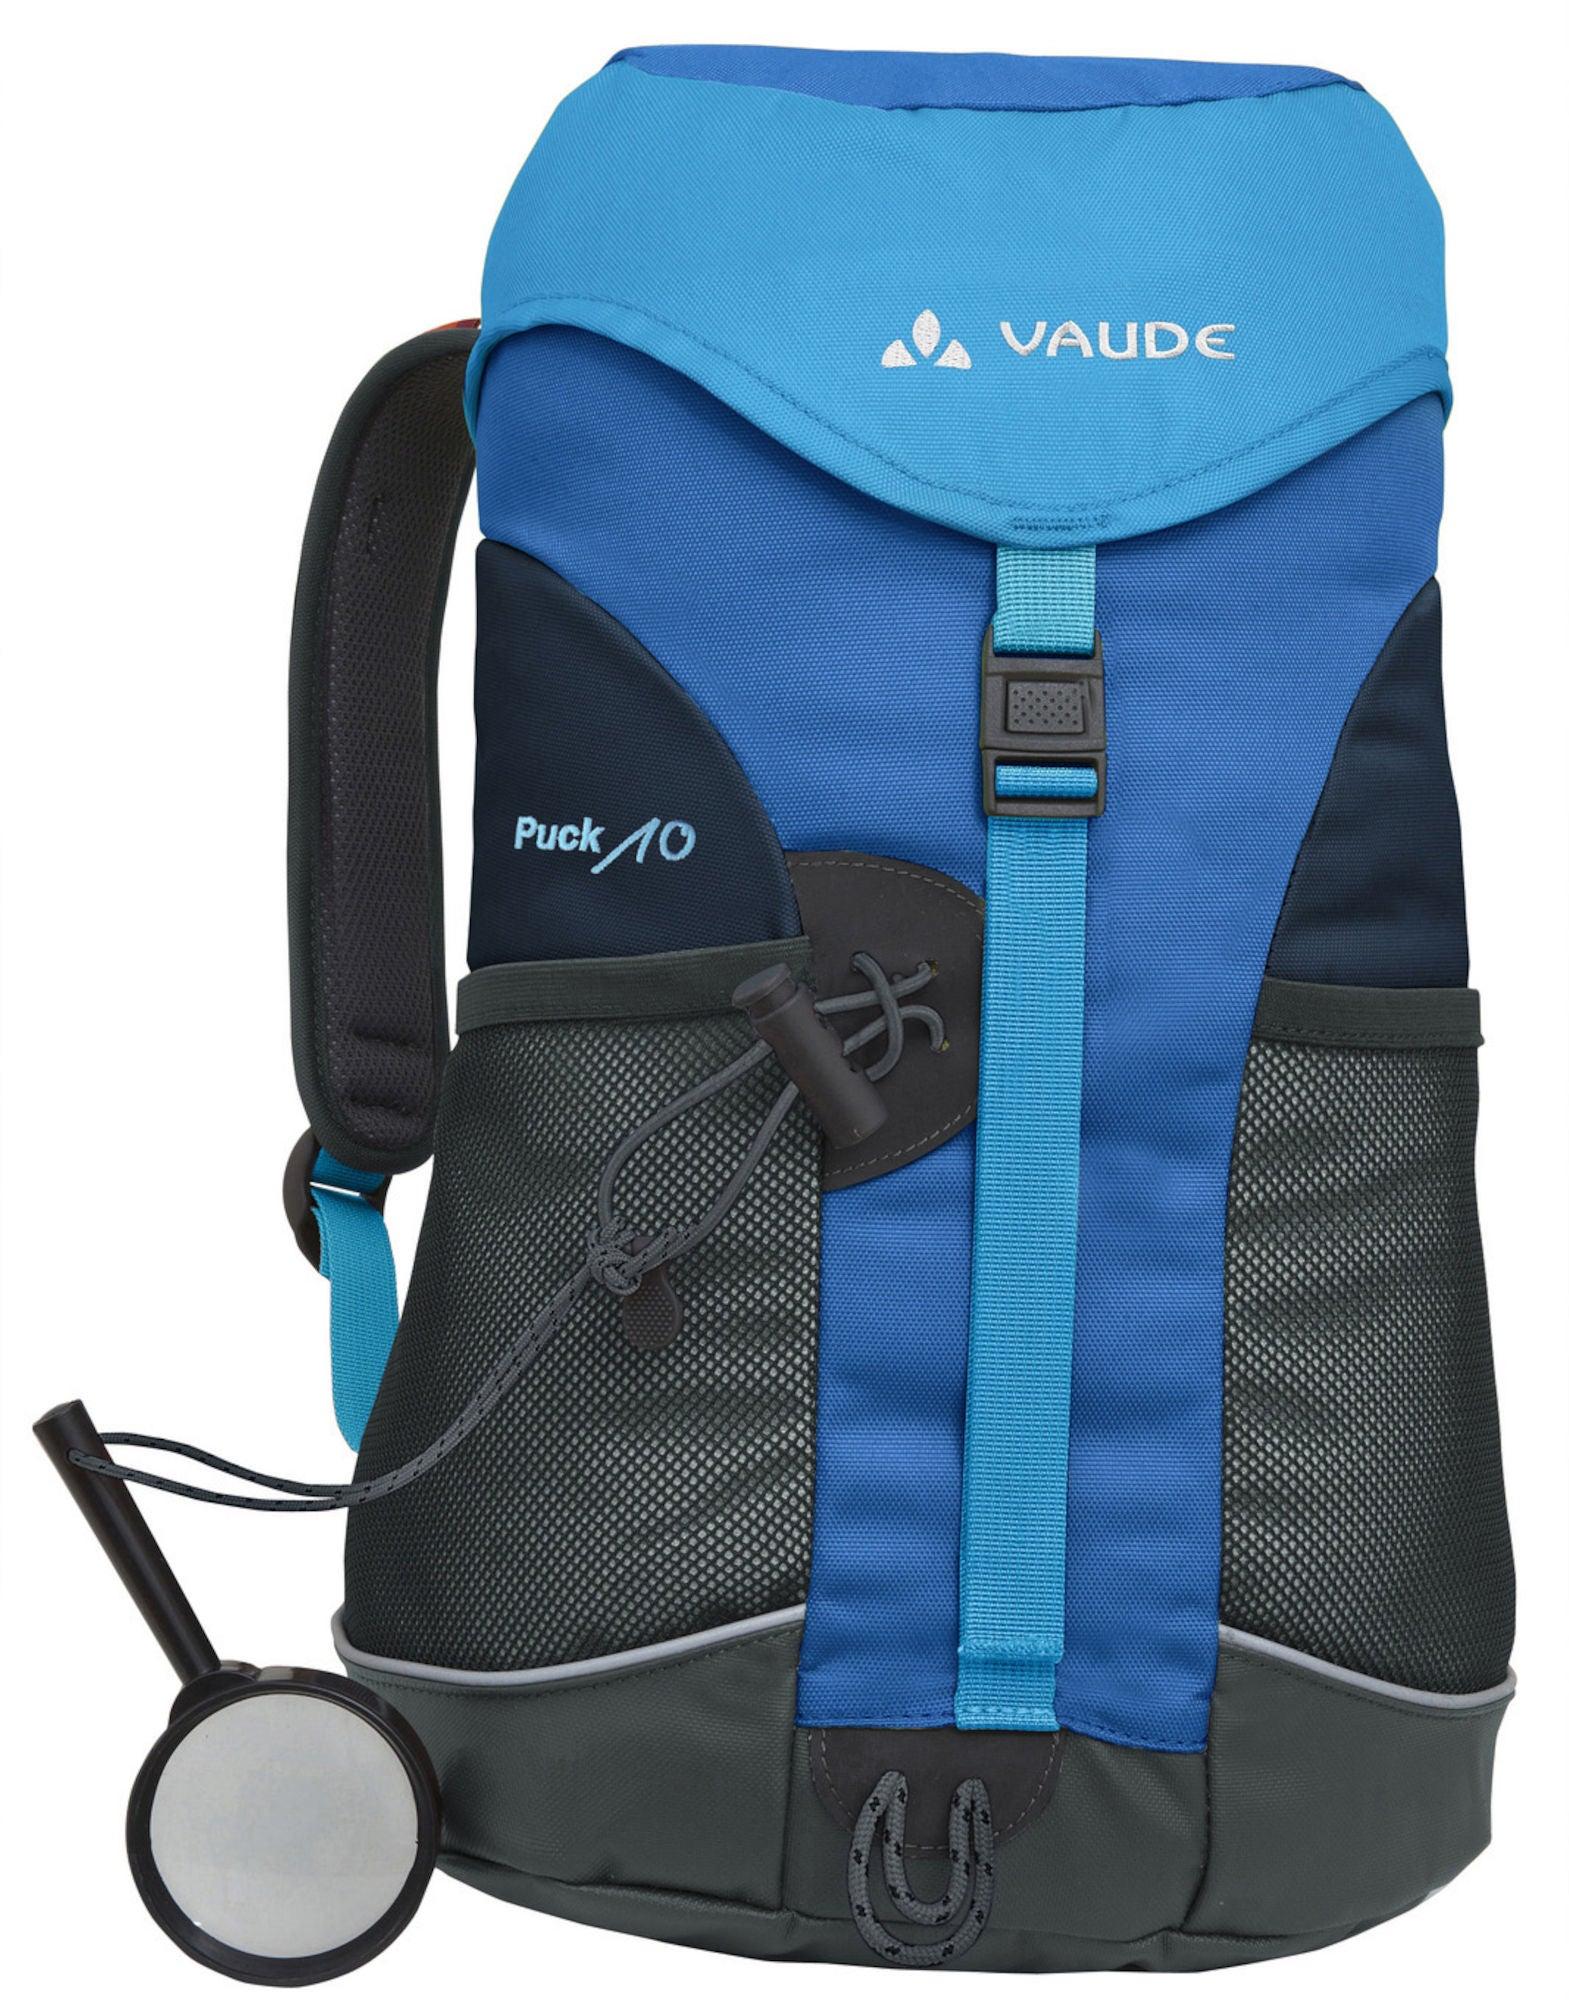 Köp Vaude Puck 10 Ryggsäck 50f2c4a87d843